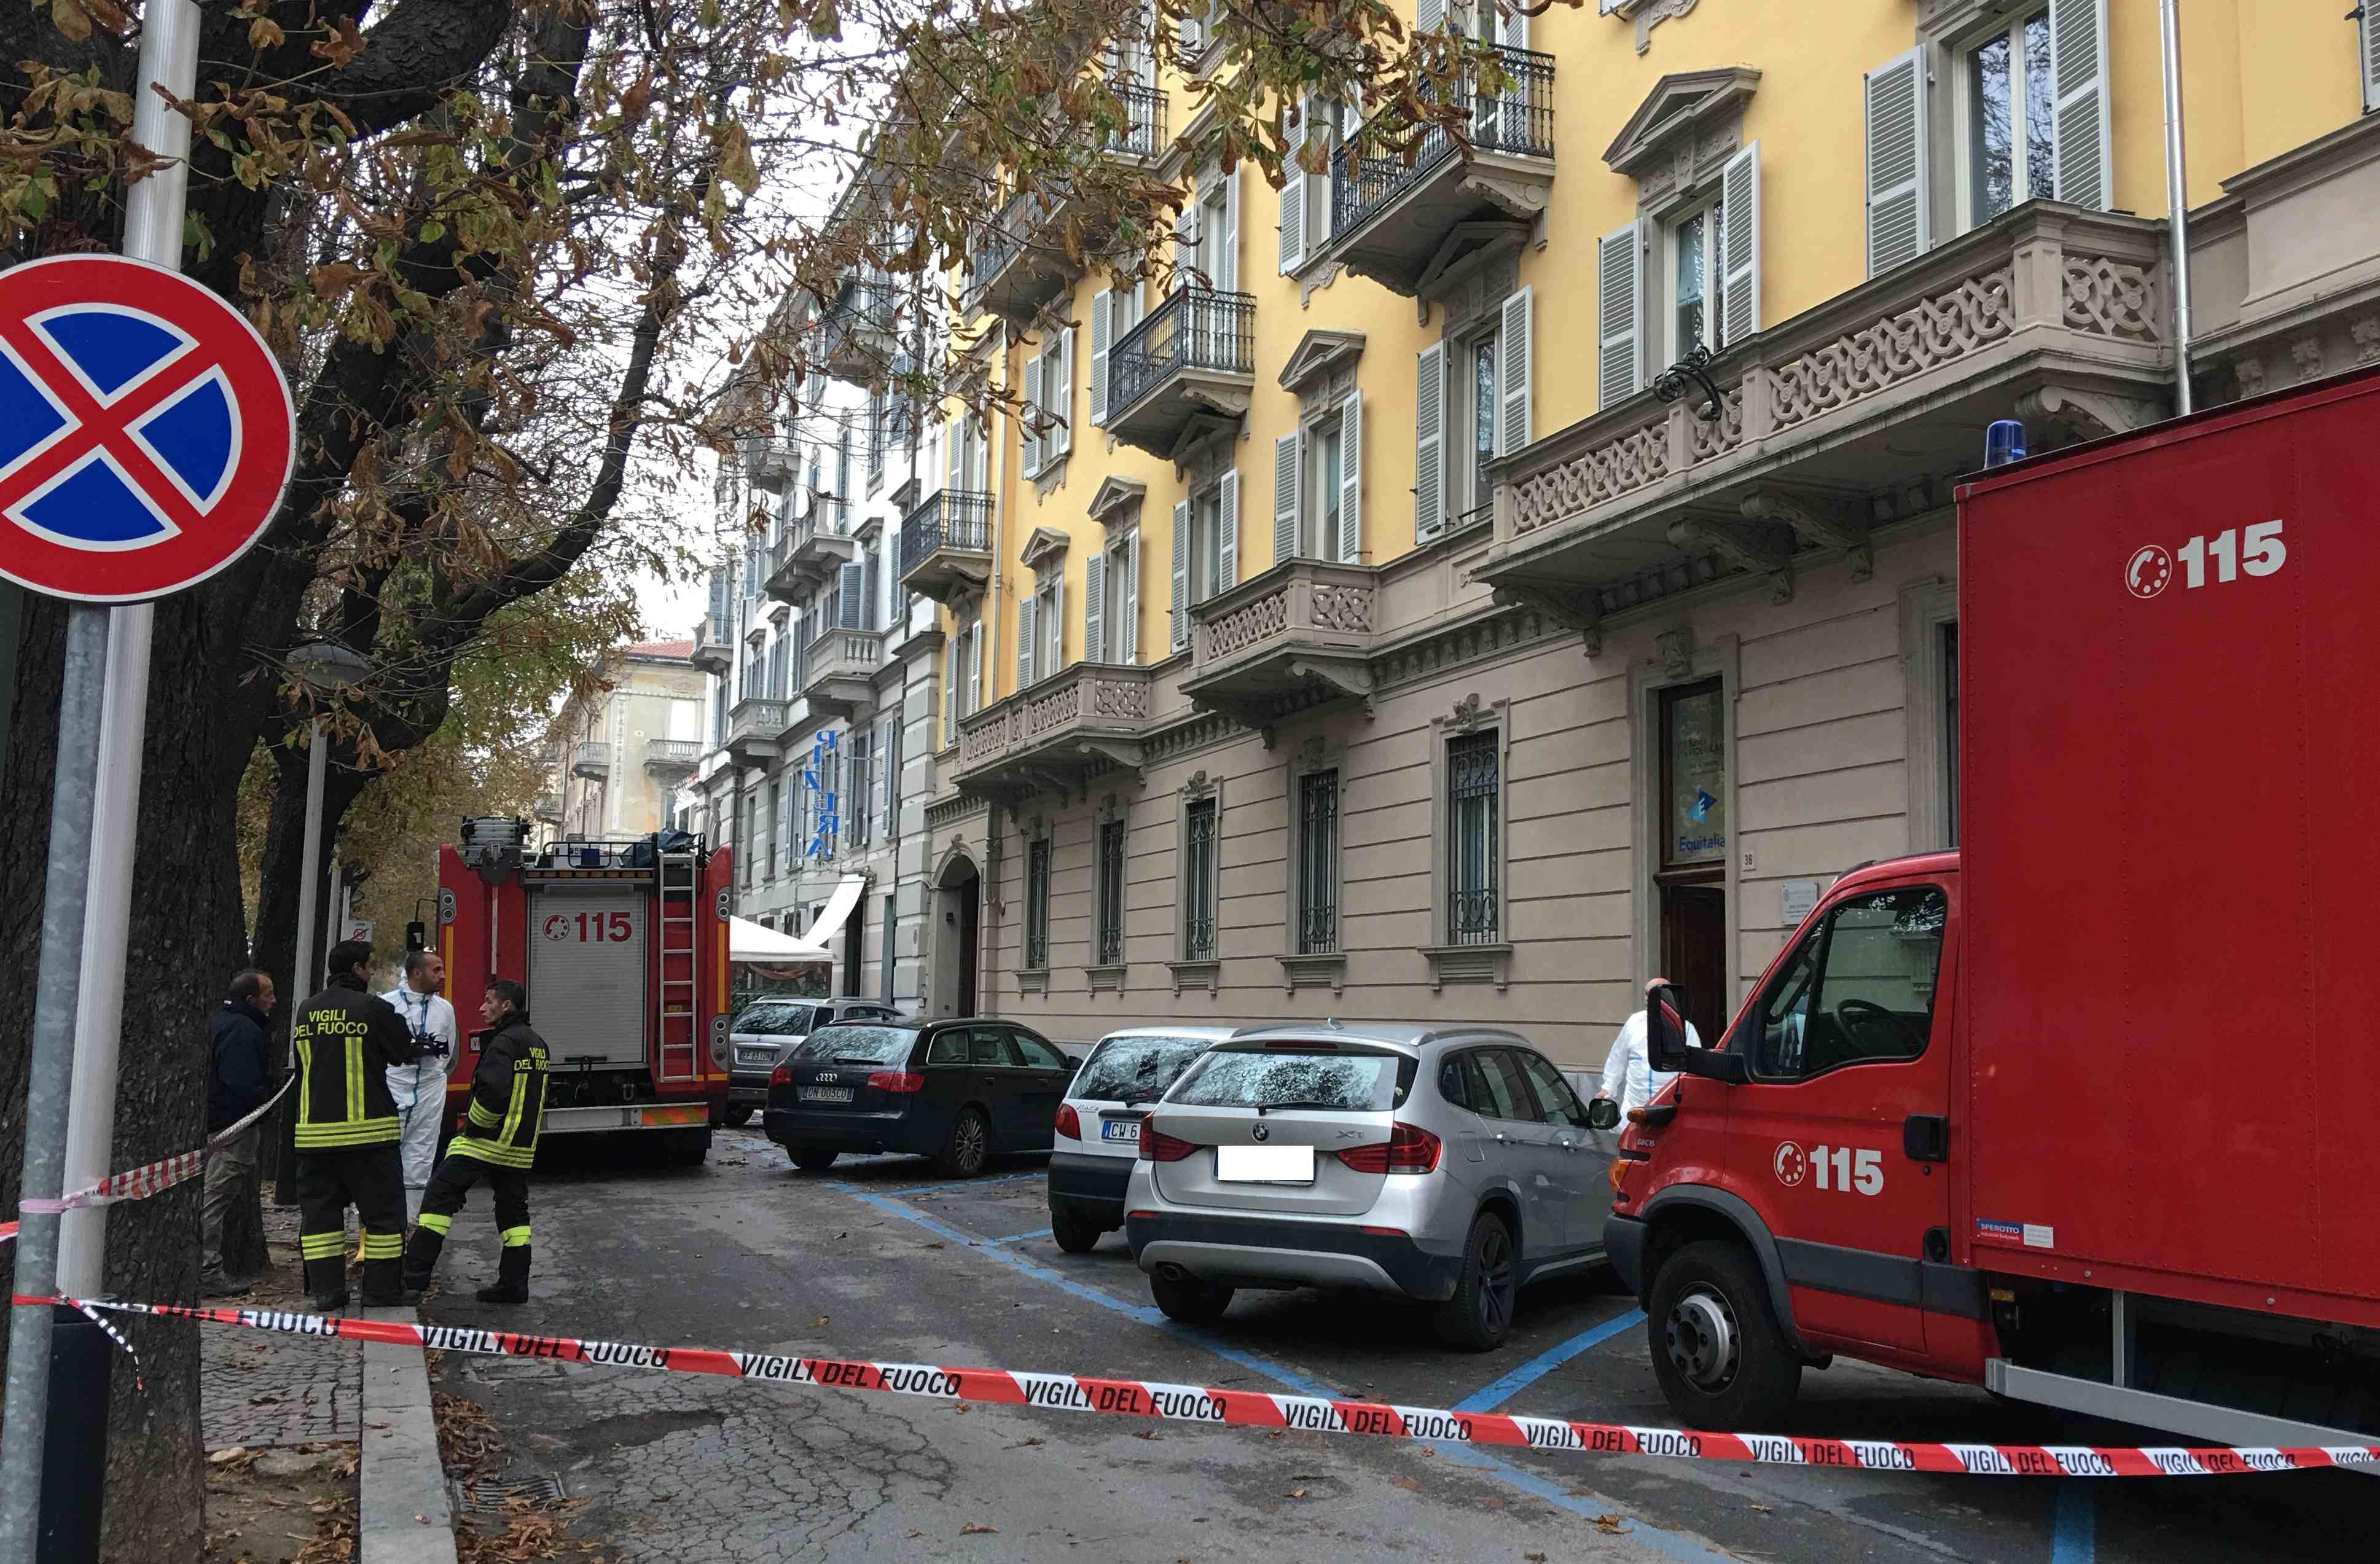 La Guida - Busta sospetta a Equitalia, evacuata la sede cuneese